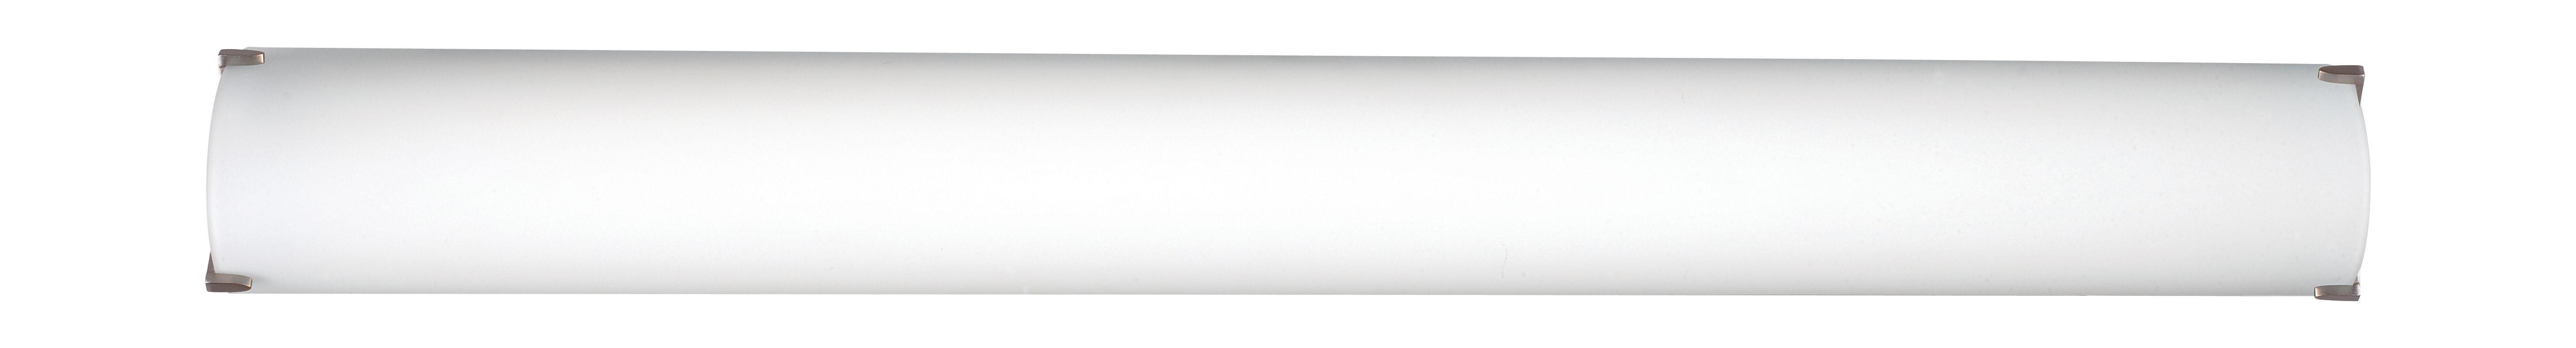 Philips FT0002836 Edge 1 Light Wall Sconce Satin Nickel Indoor